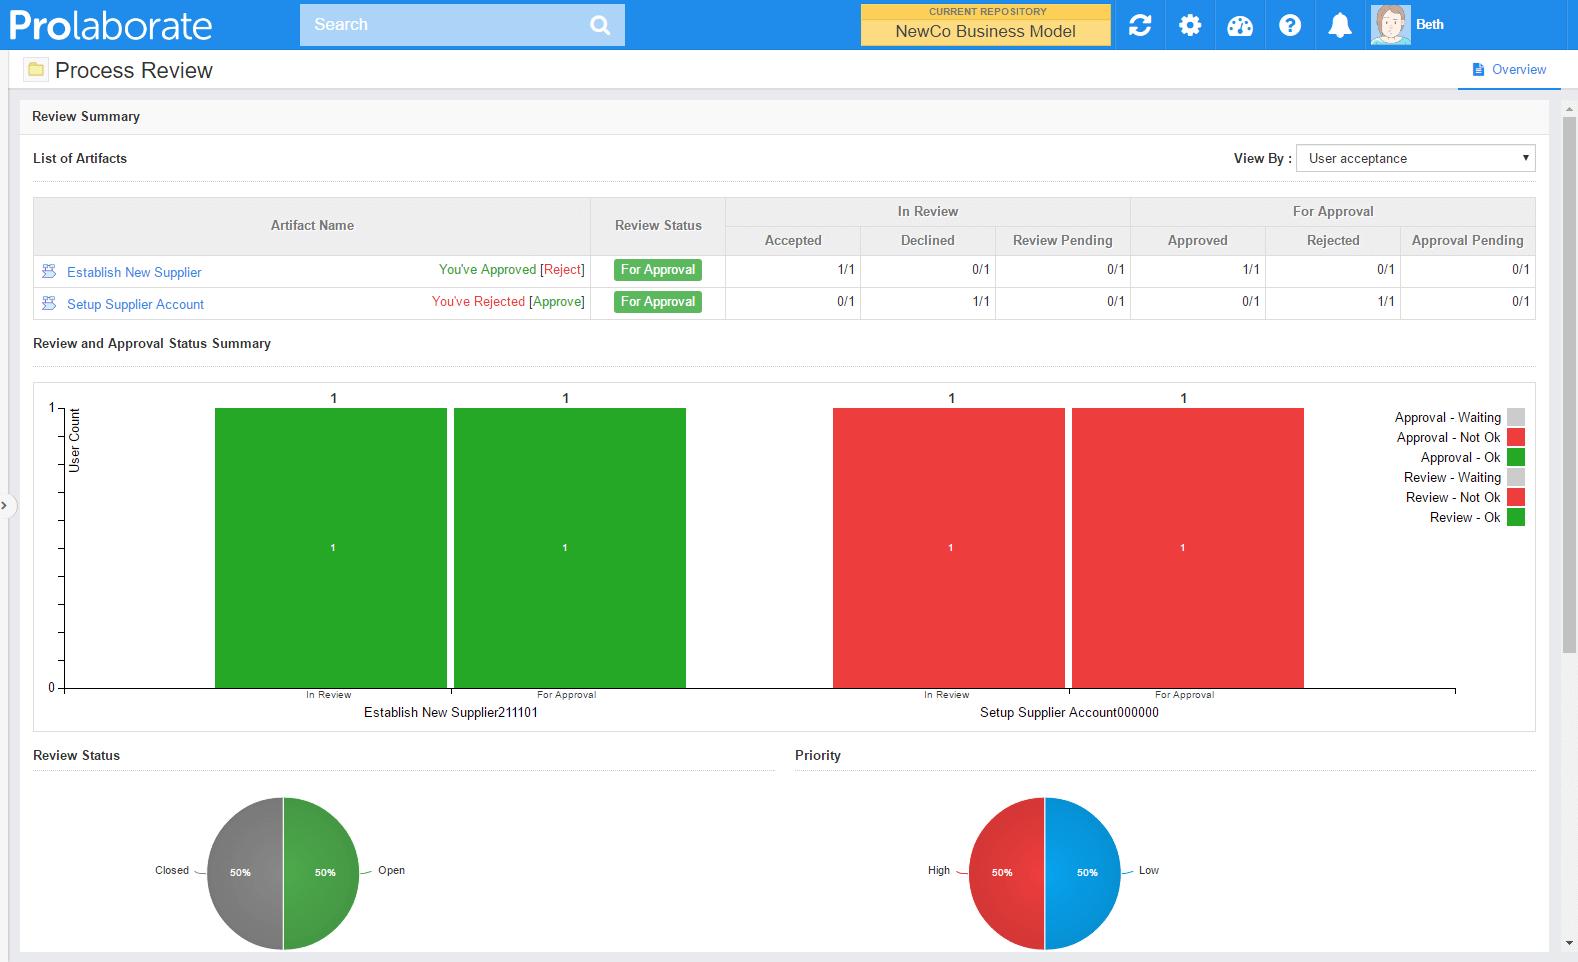 monitor review progress